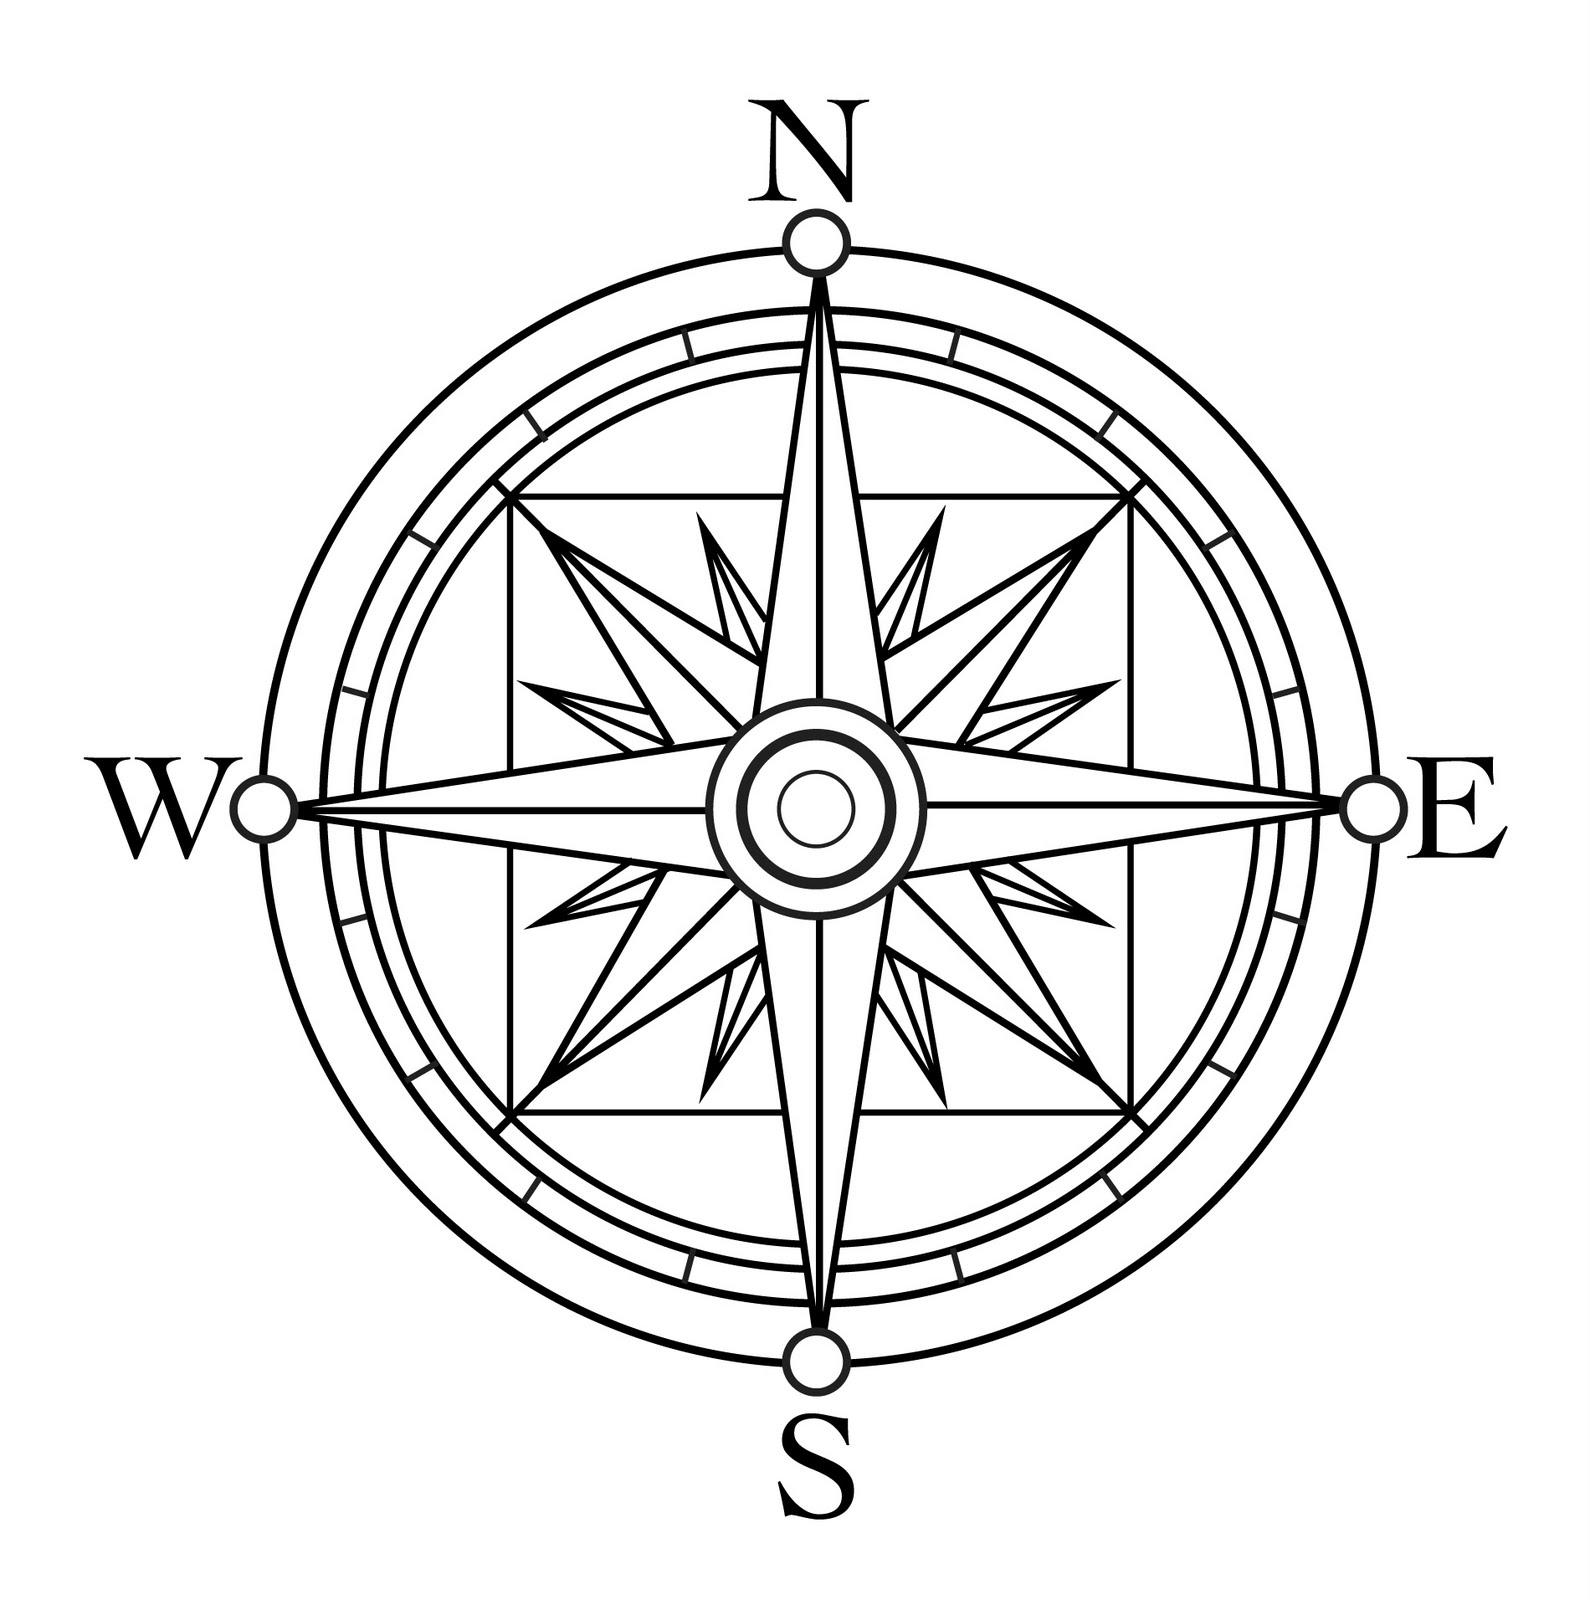 1590x1600 Compass Rose Coloring Page Murderthestout